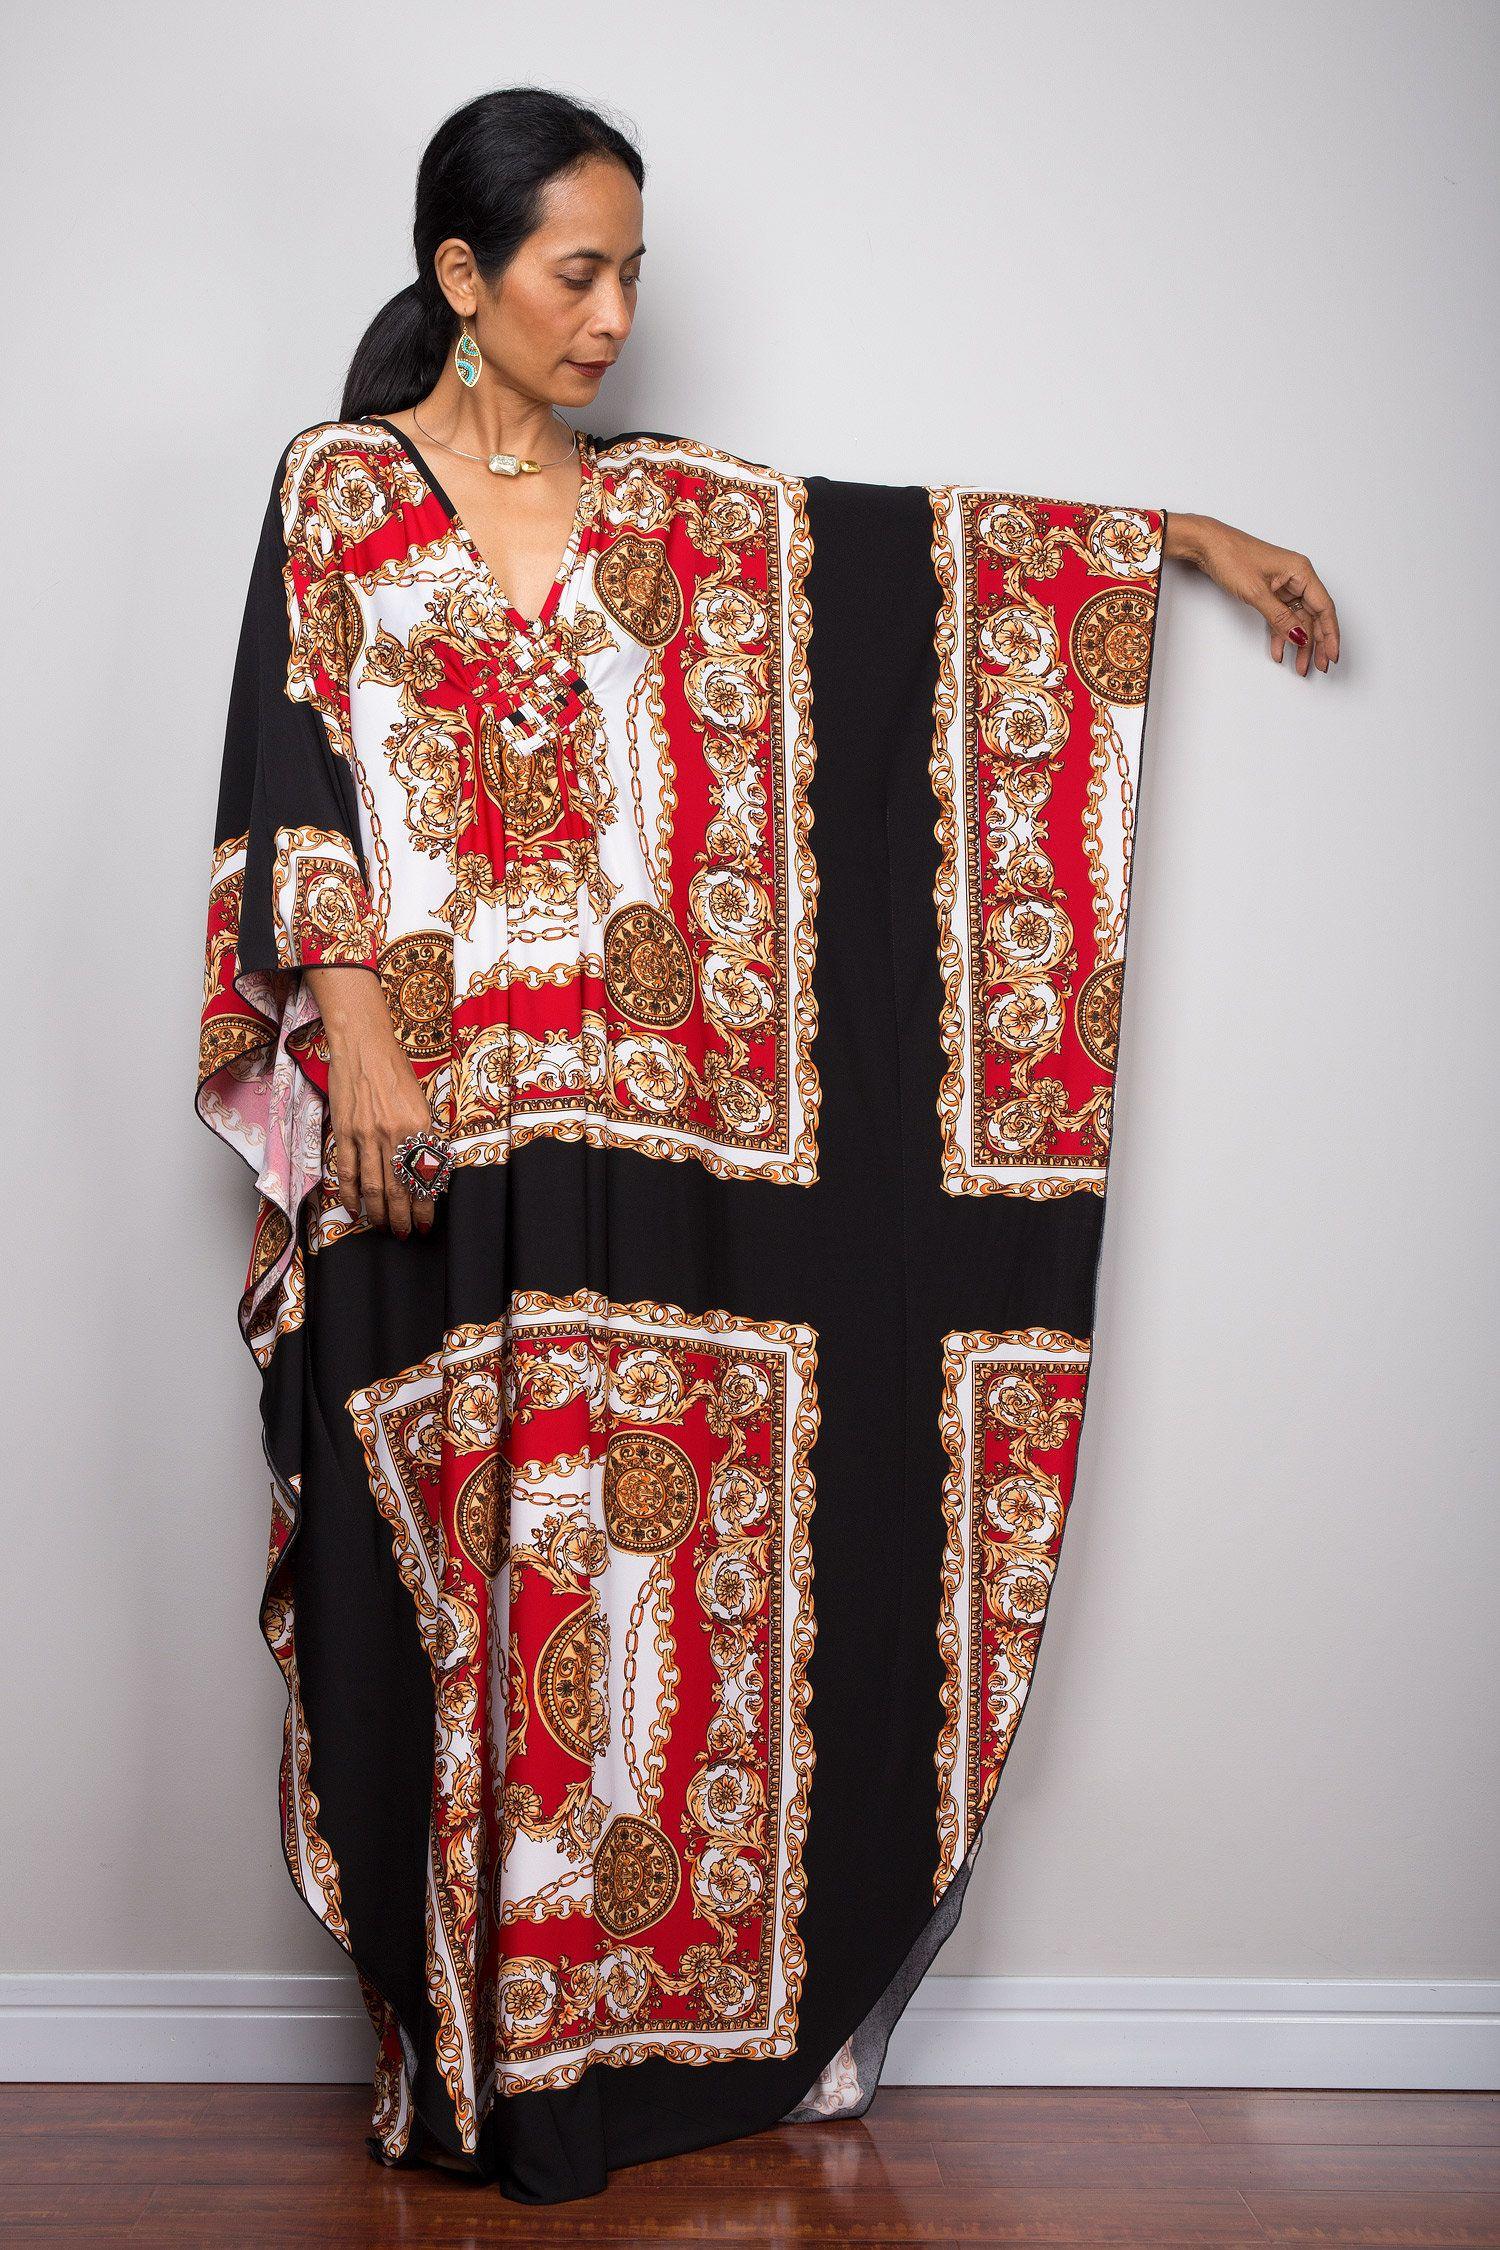 Boho Kaftan Dress Long Loose Fitting Maxi Frock Dress Summer Dress With Bohemian Print Fu1p Maxi Frocks Kaftan Dress Frock Dress [ 2250 x 1500 Pixel ]